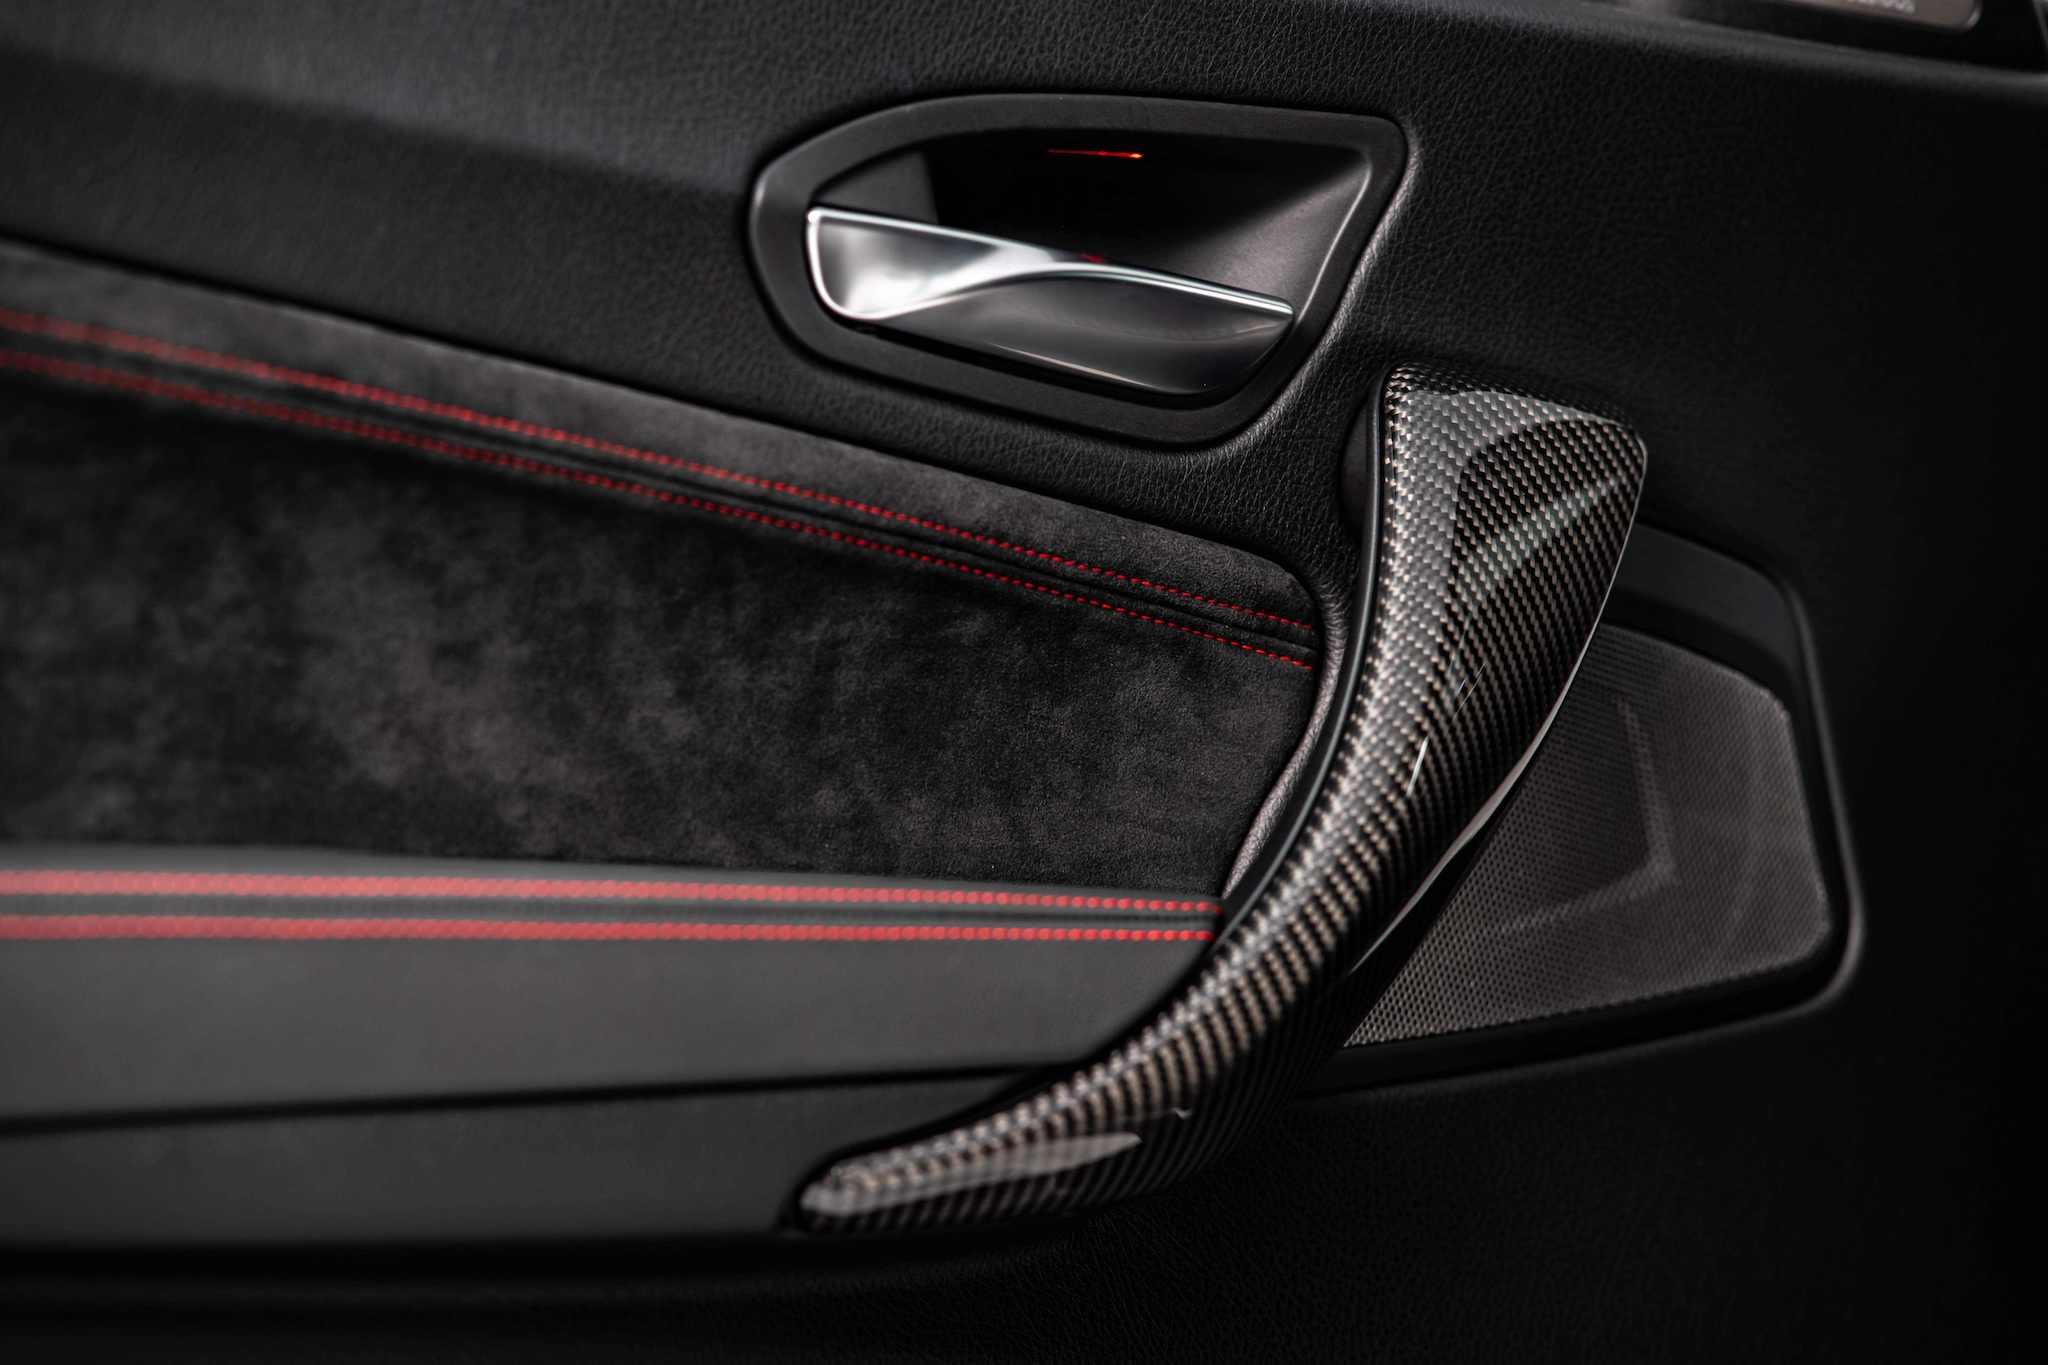 M2 CS 車內門板以柔軟麂皮包覆搭配碳纖維材質把手。